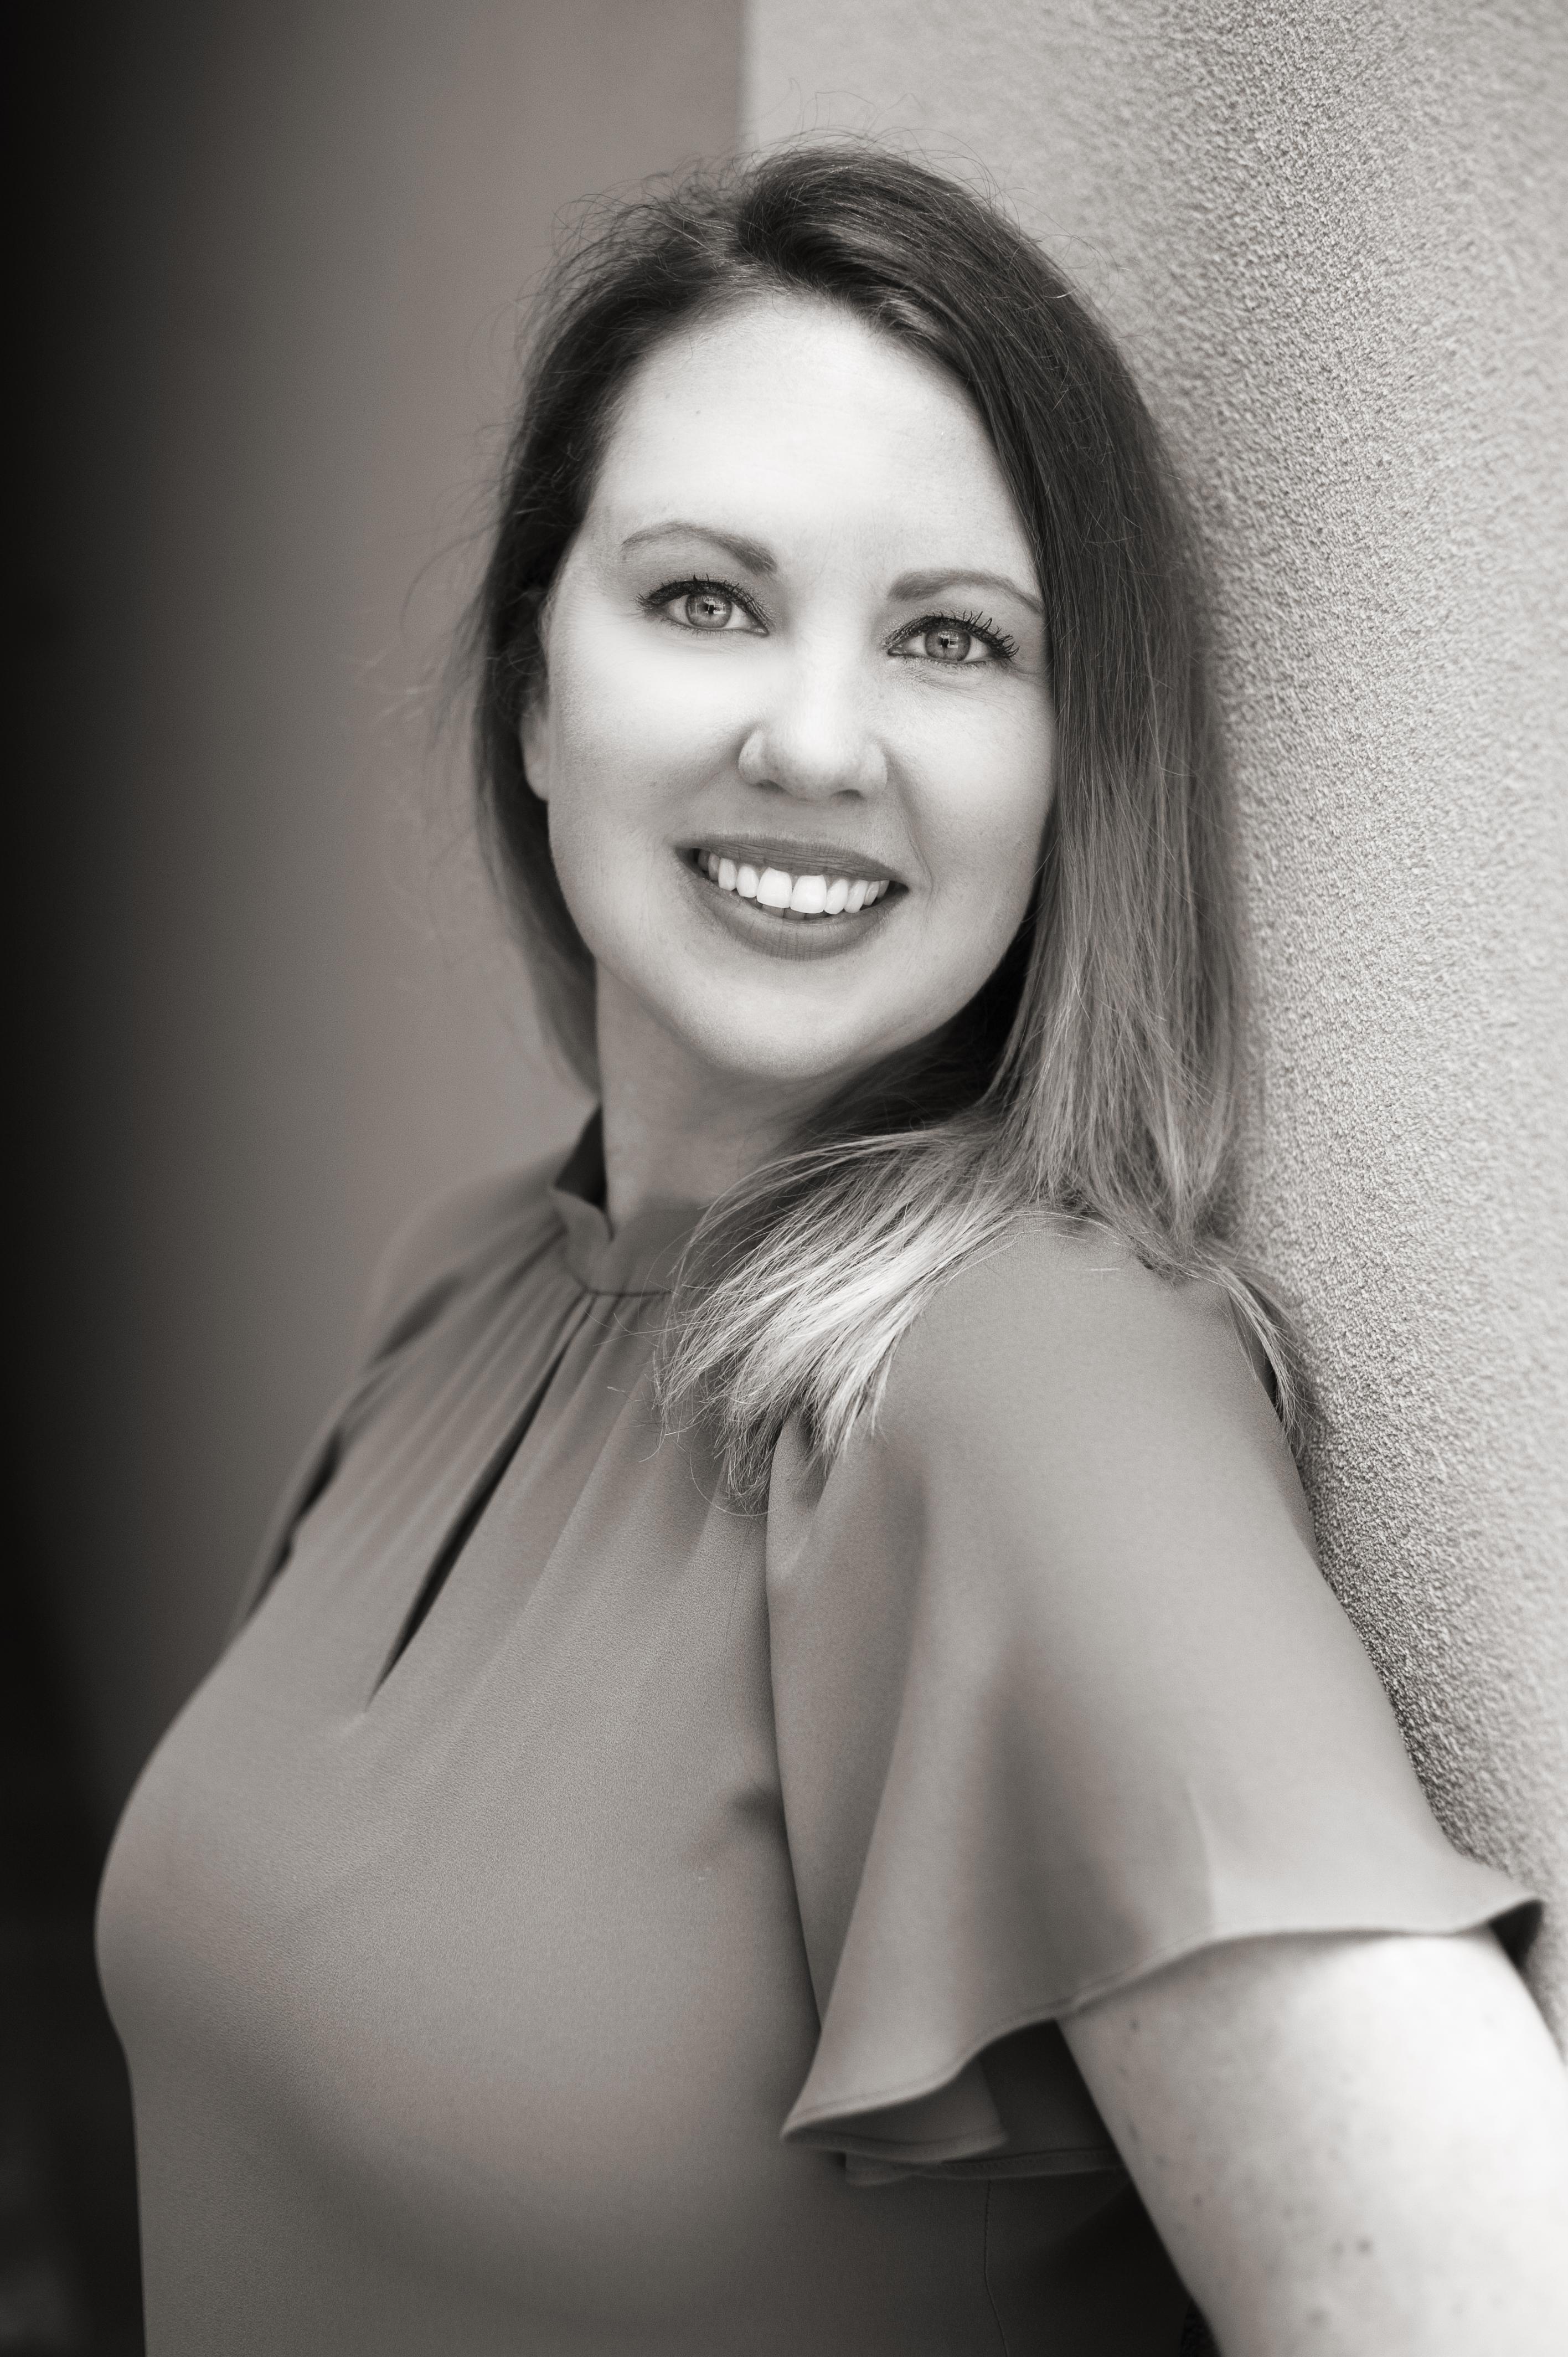 Kate Gable